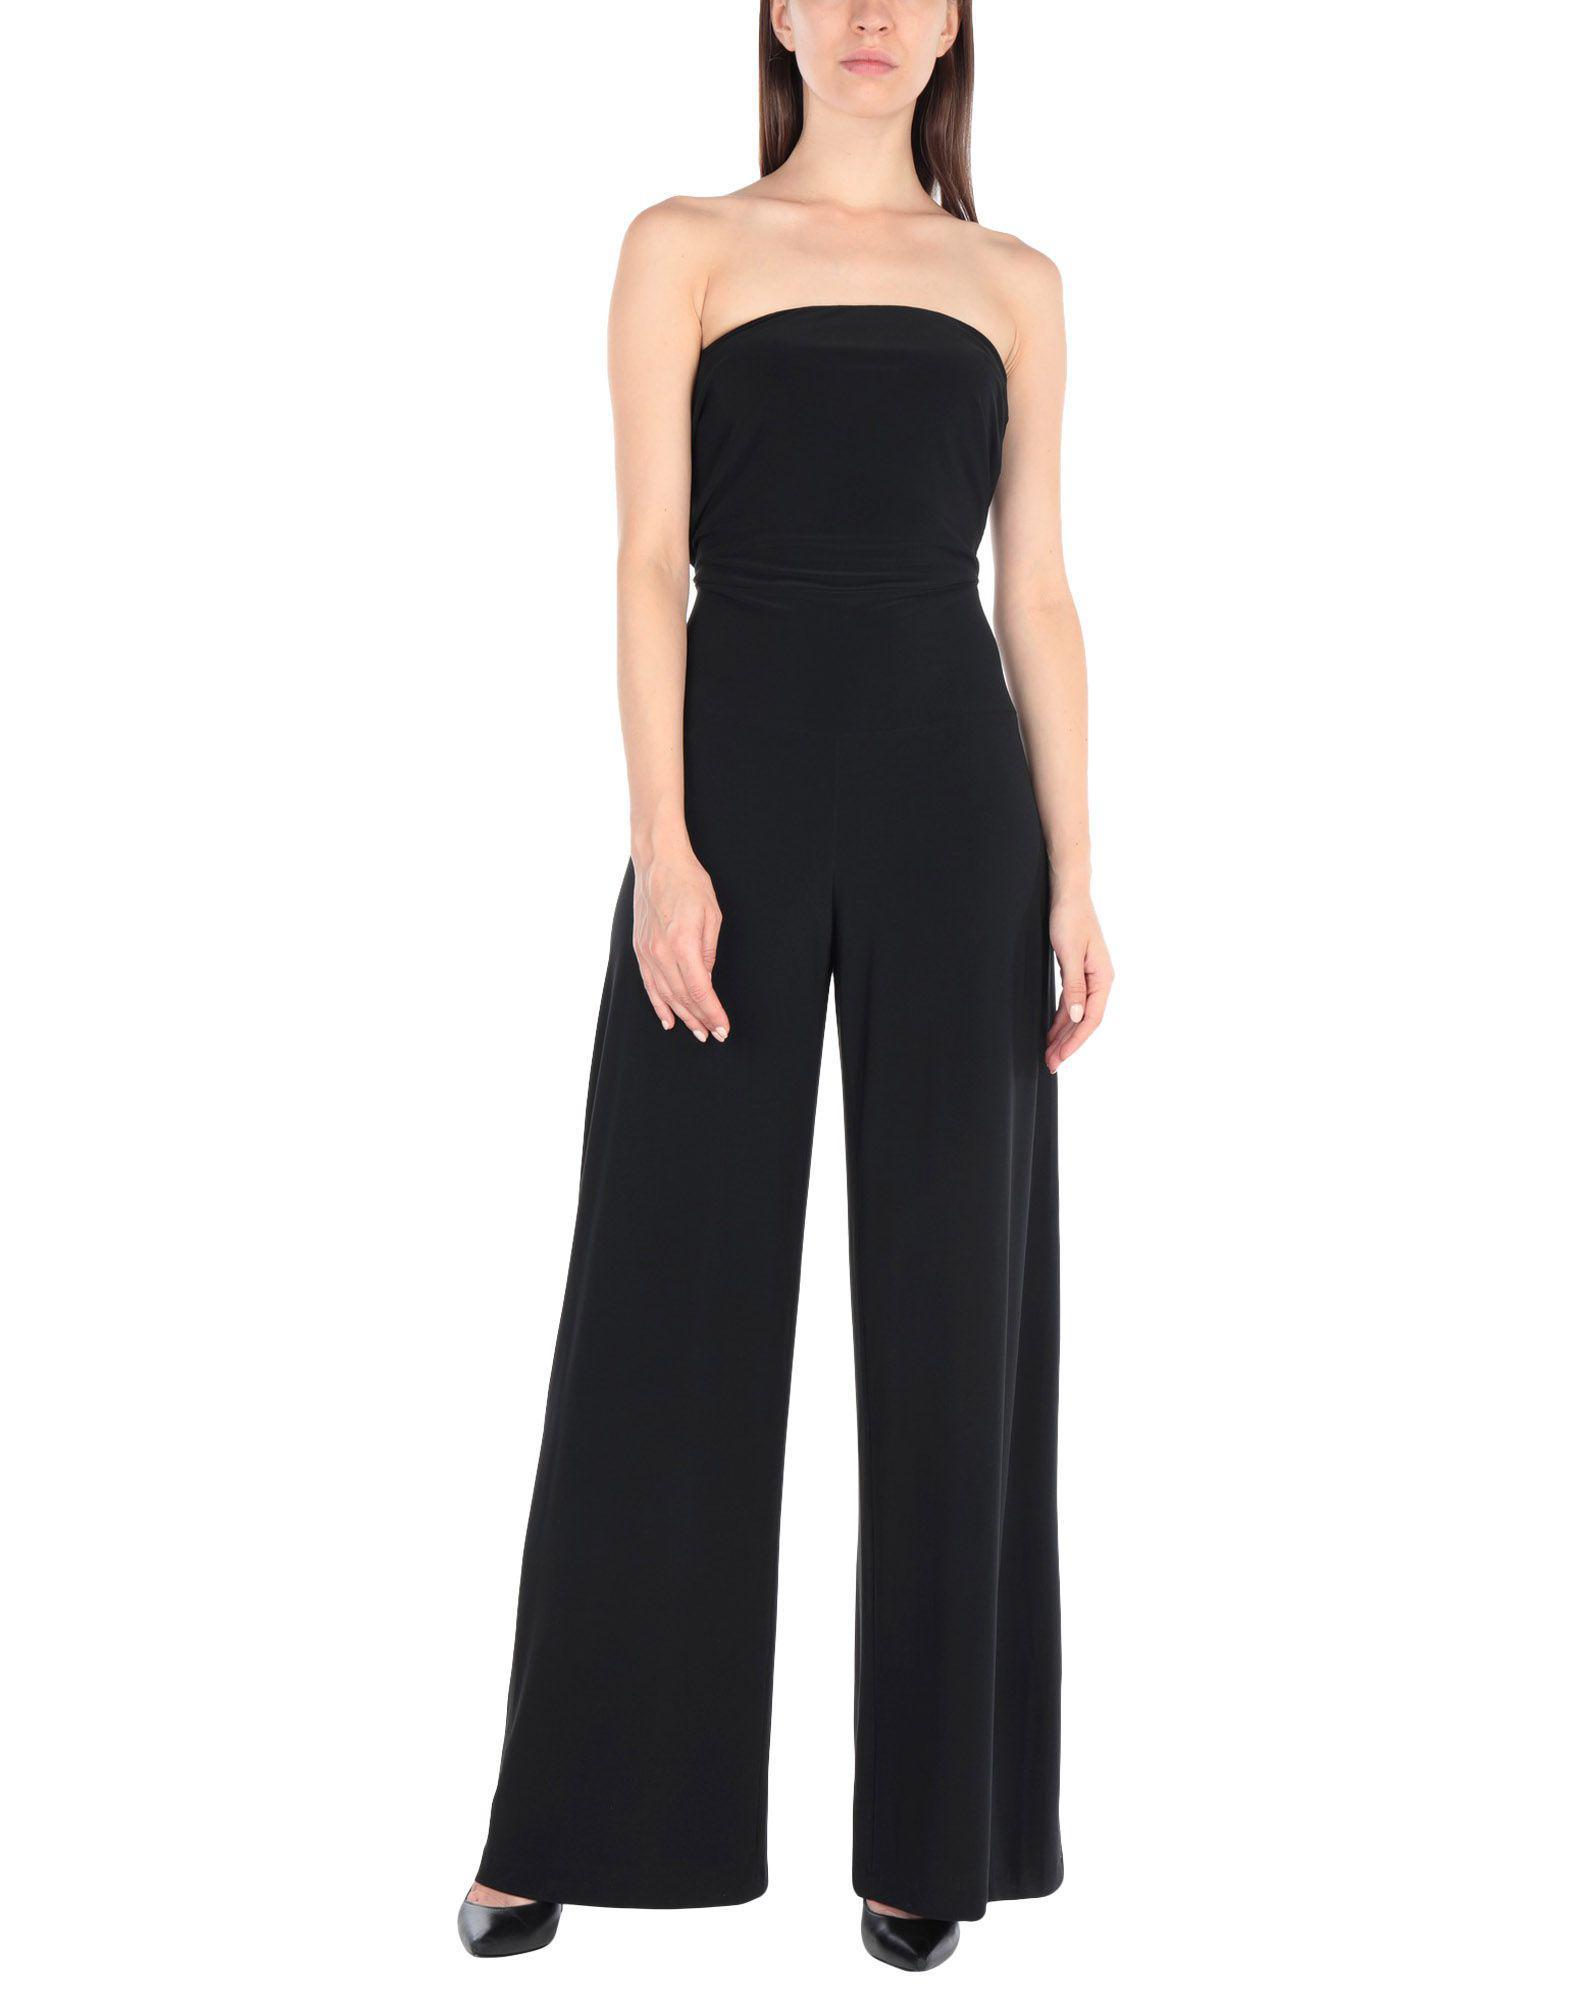 d6e9a00349c Lyst - Norma Kamali Jumpsuit in Black